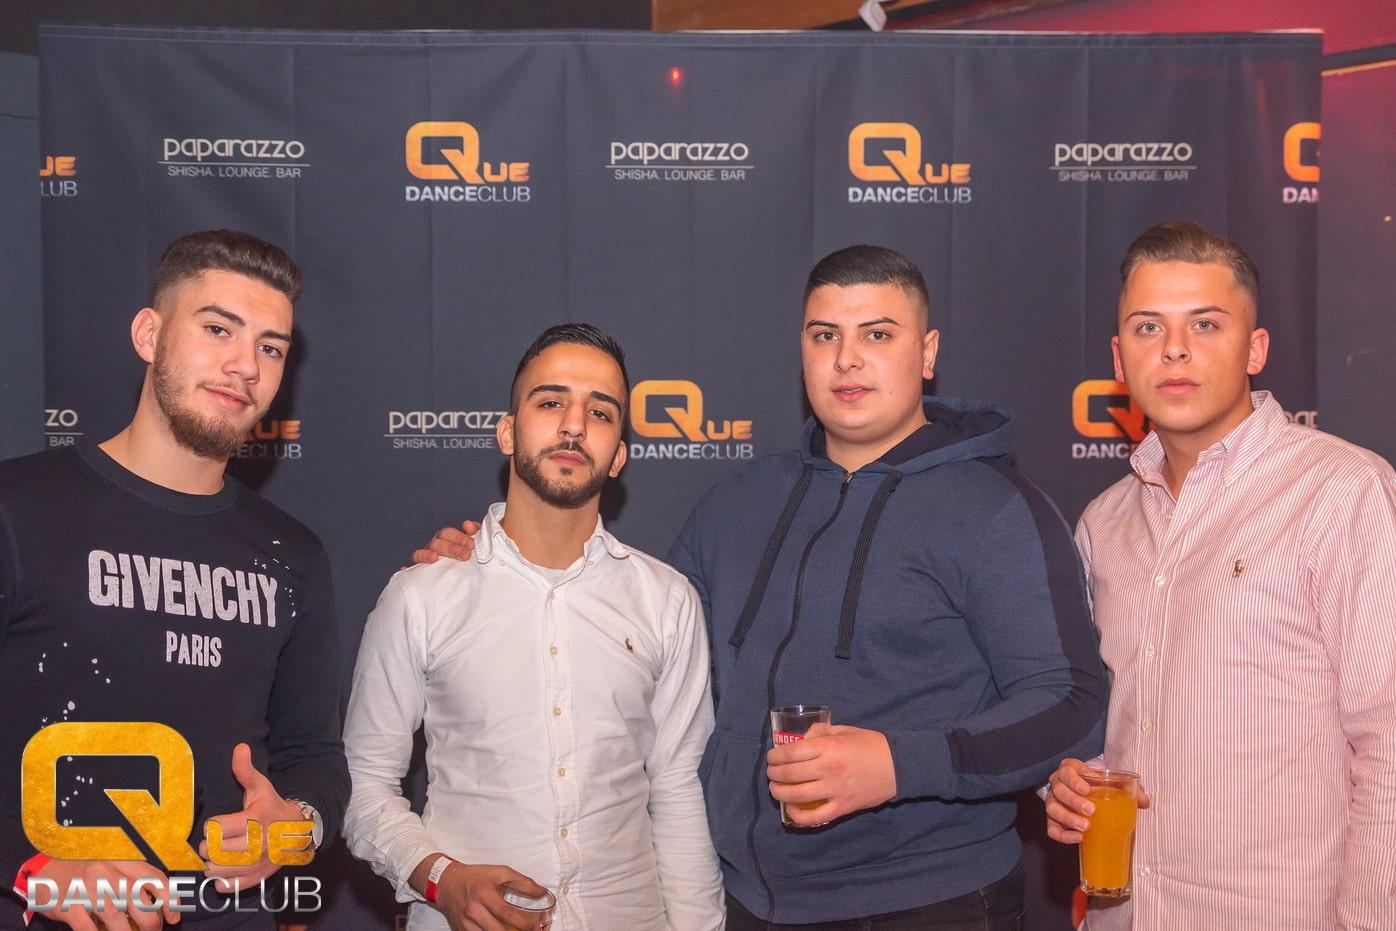 2018_12_08_Que_Danceclub_Paparazzo_Night_Ardian_Bujupi_Live_Nightlife_Scene_Timo_008